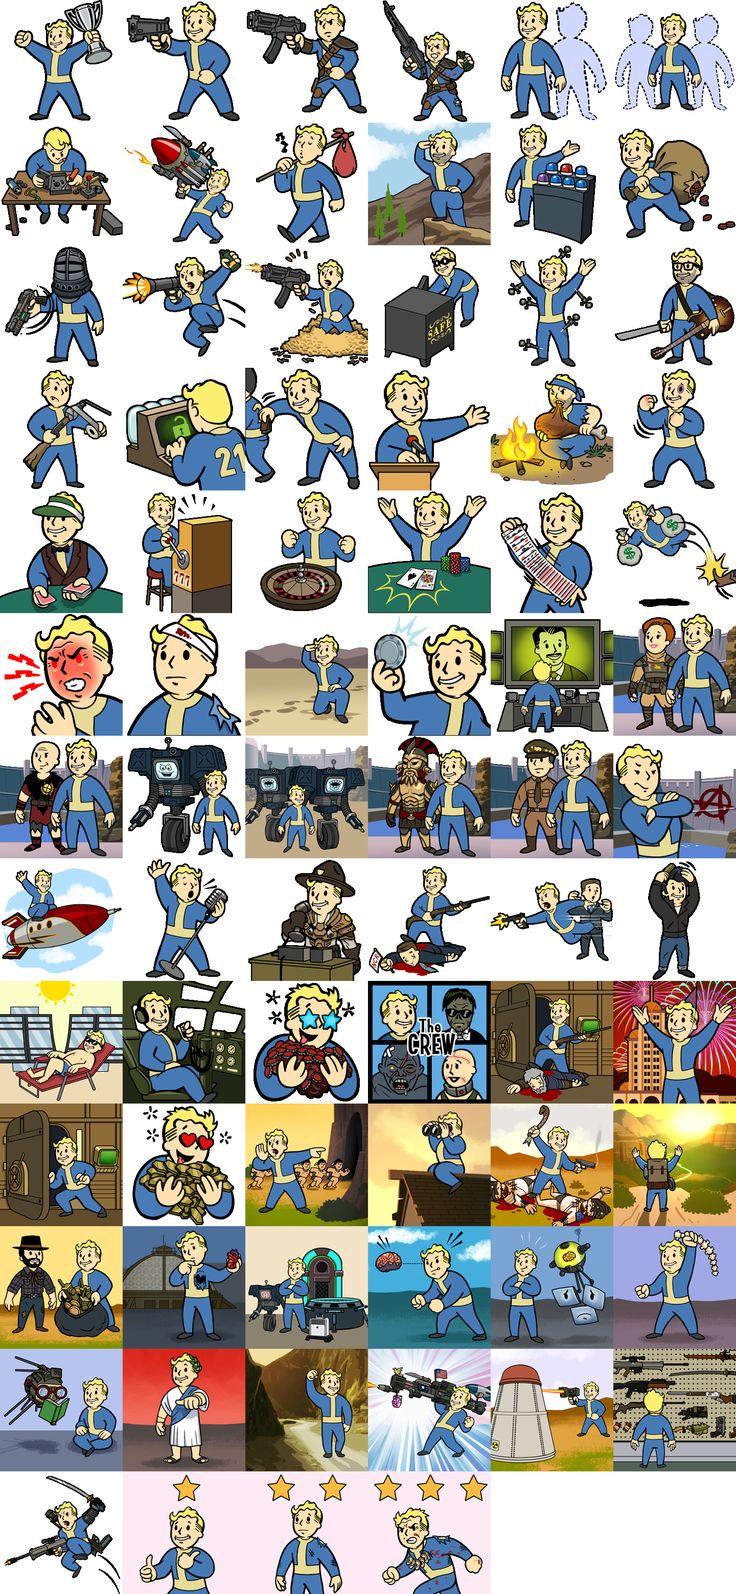 Fallout: New Vegas 76 Trophies